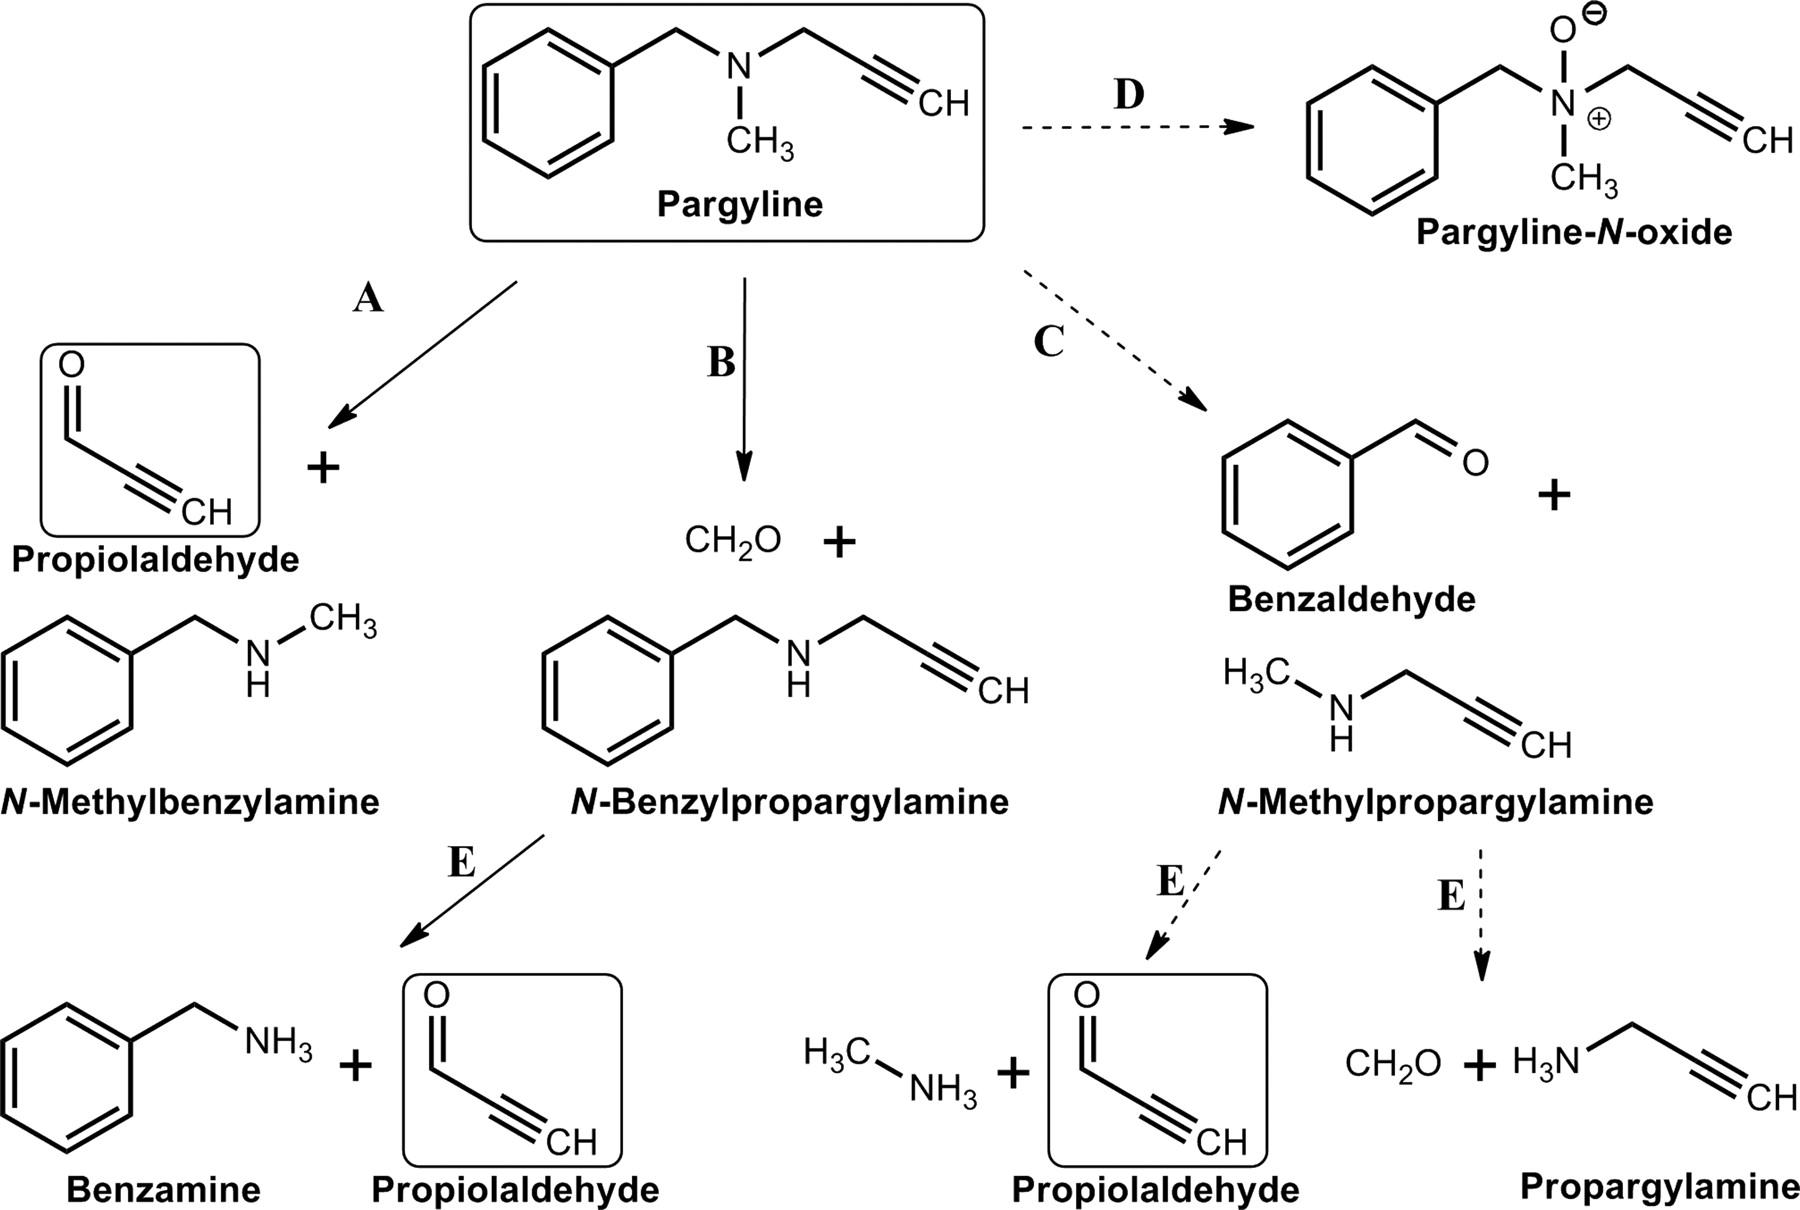 Aldehyde Dehydrogenase Inhibitors: a Comprehensive Review